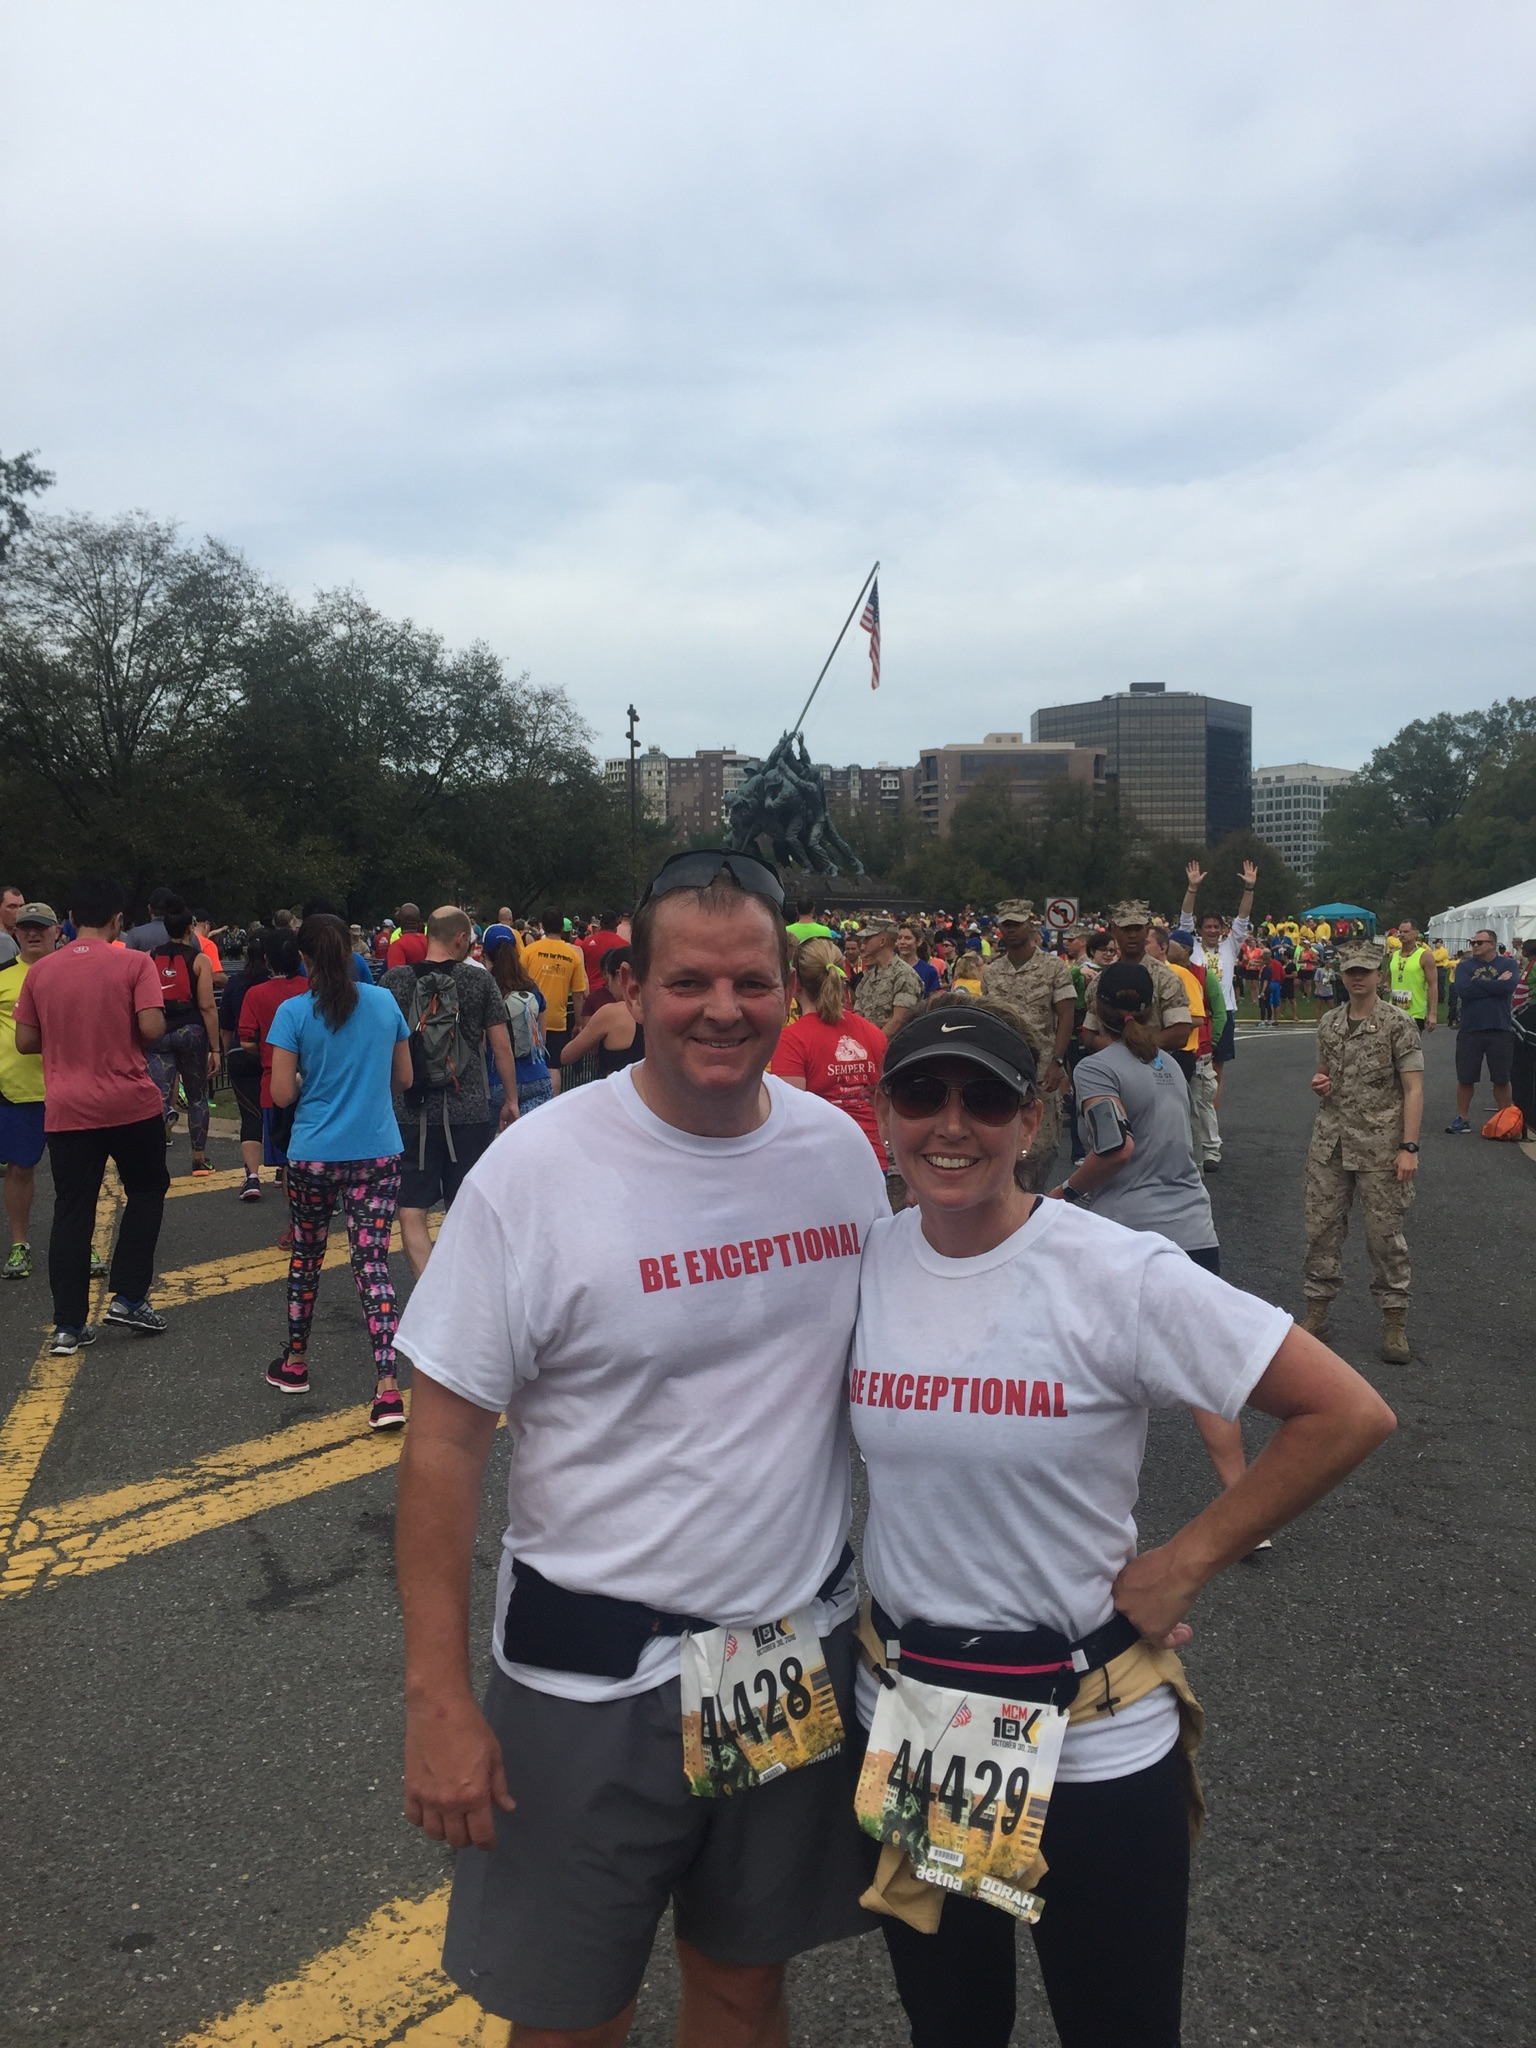 Van and Allyson Brinson at the Marathon